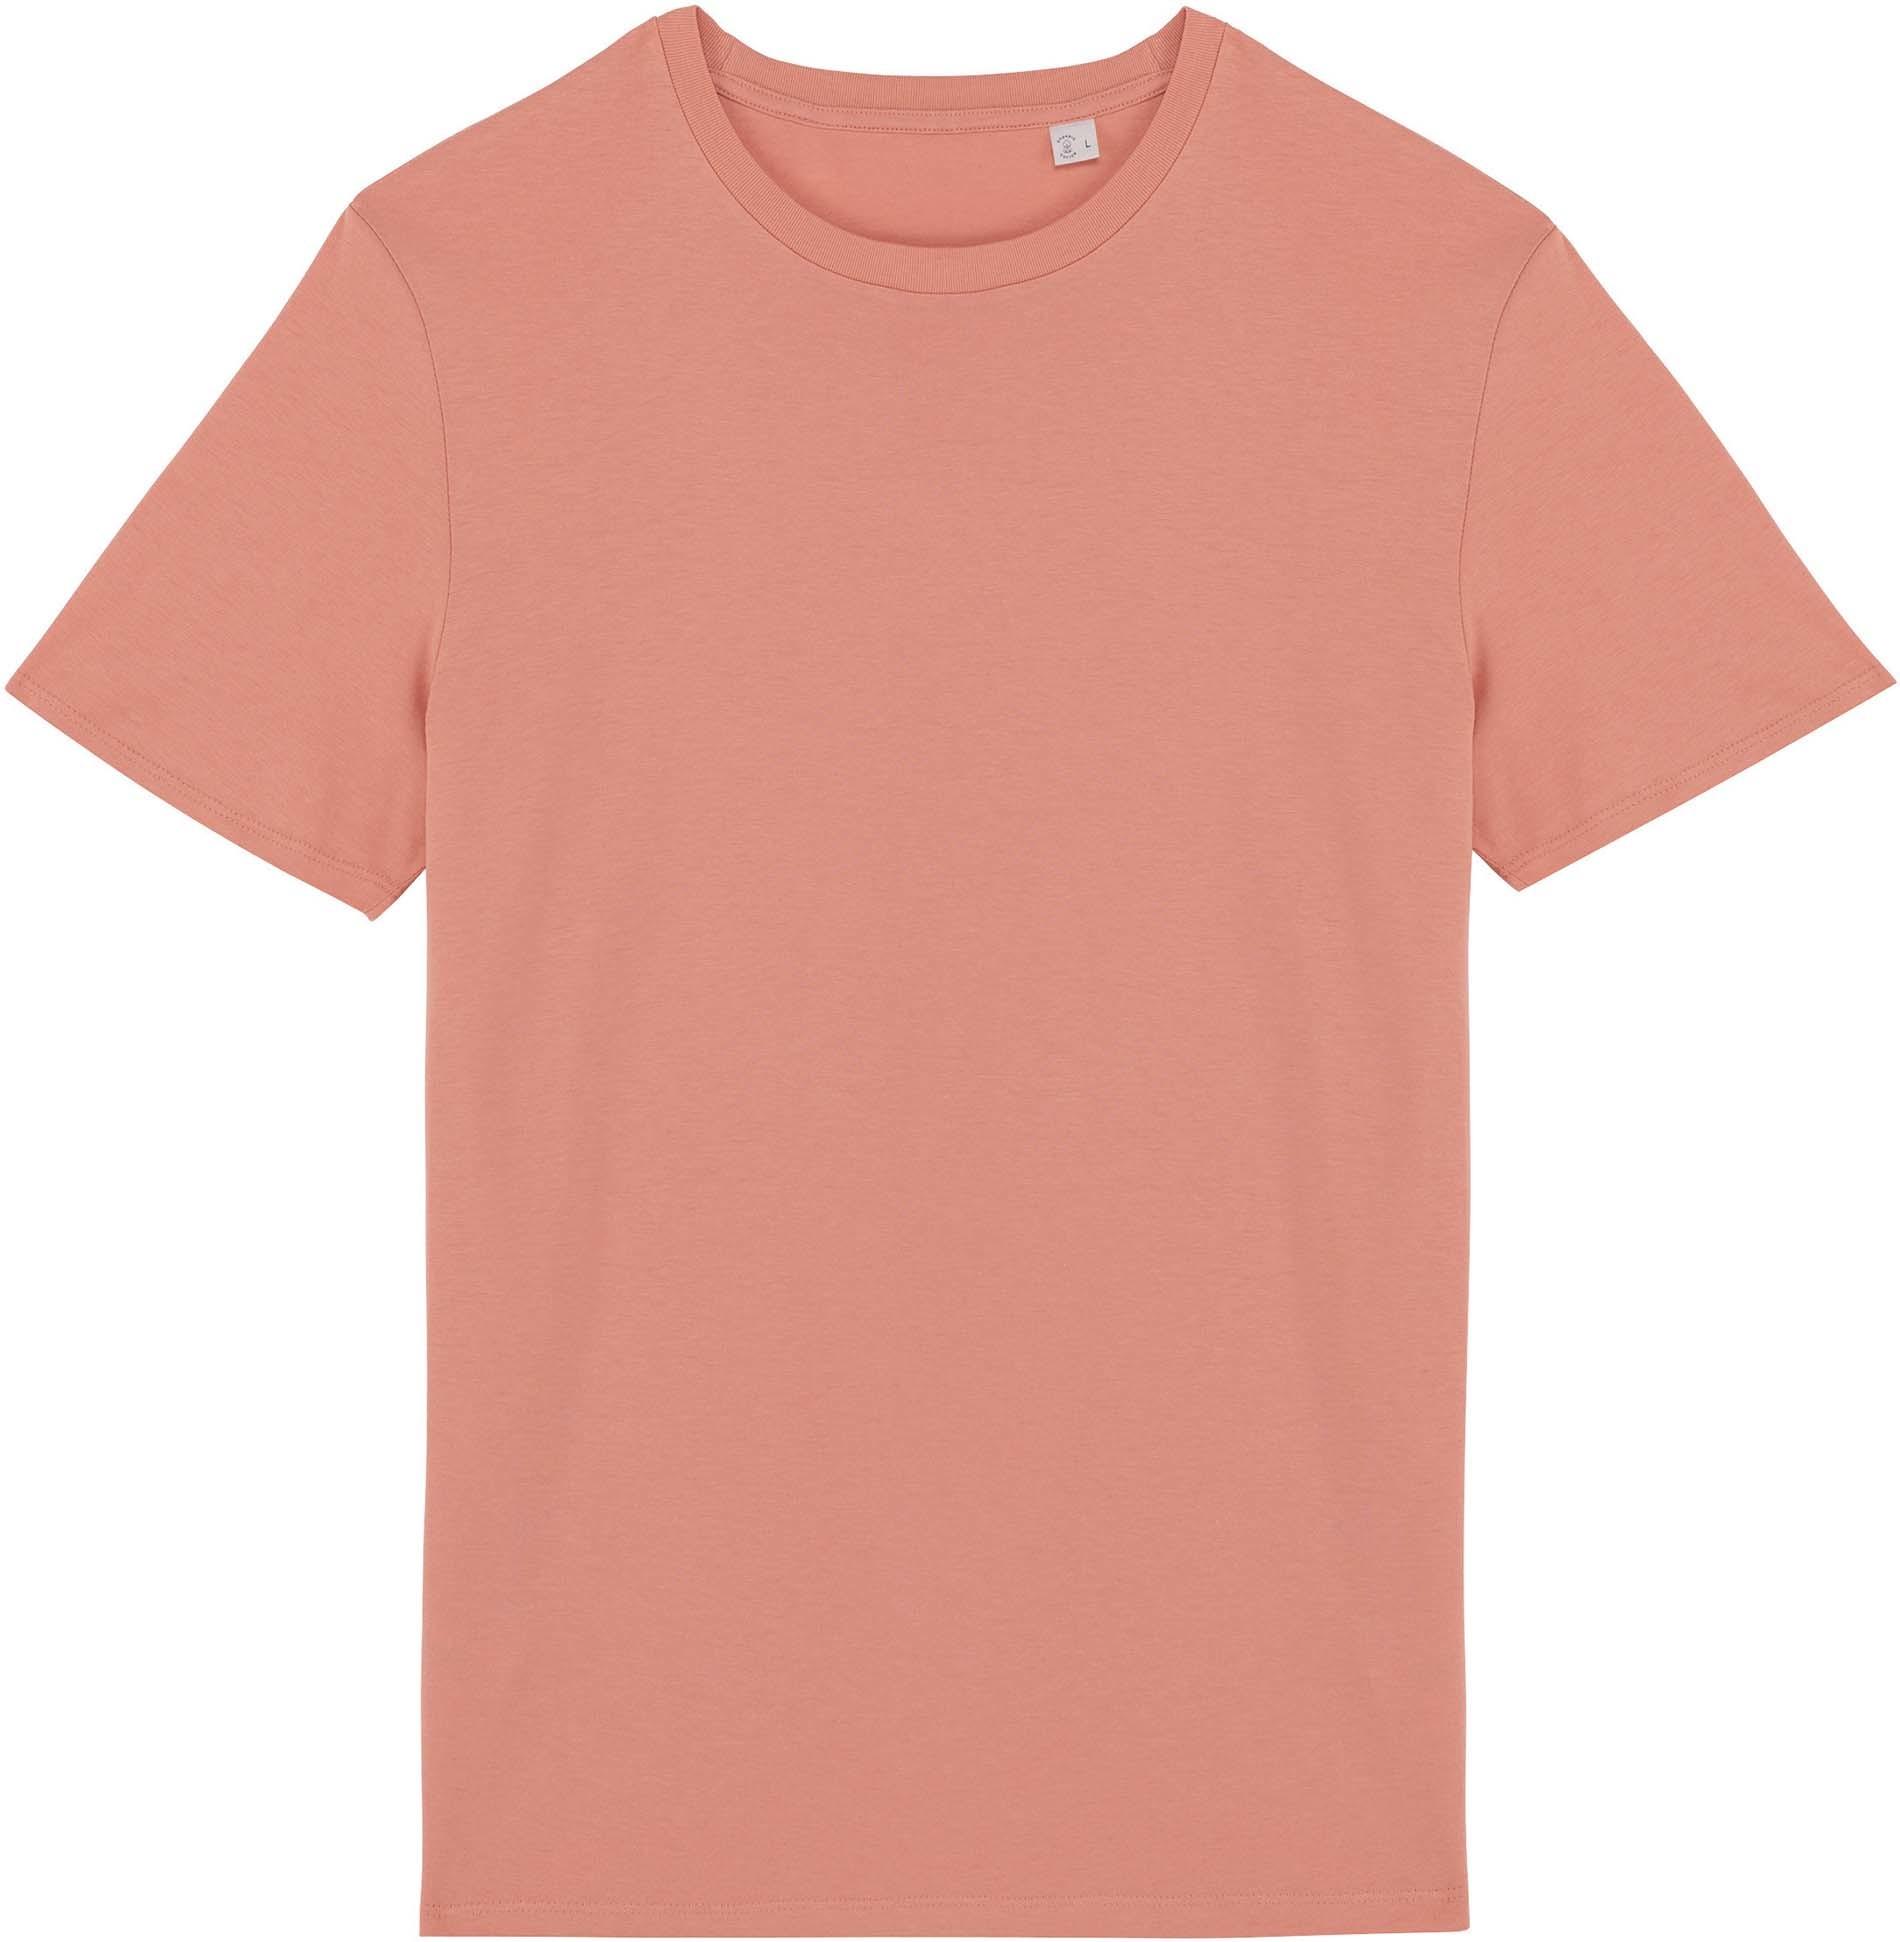 Tee-shirt manches courtes unisexe - 2-1843-1